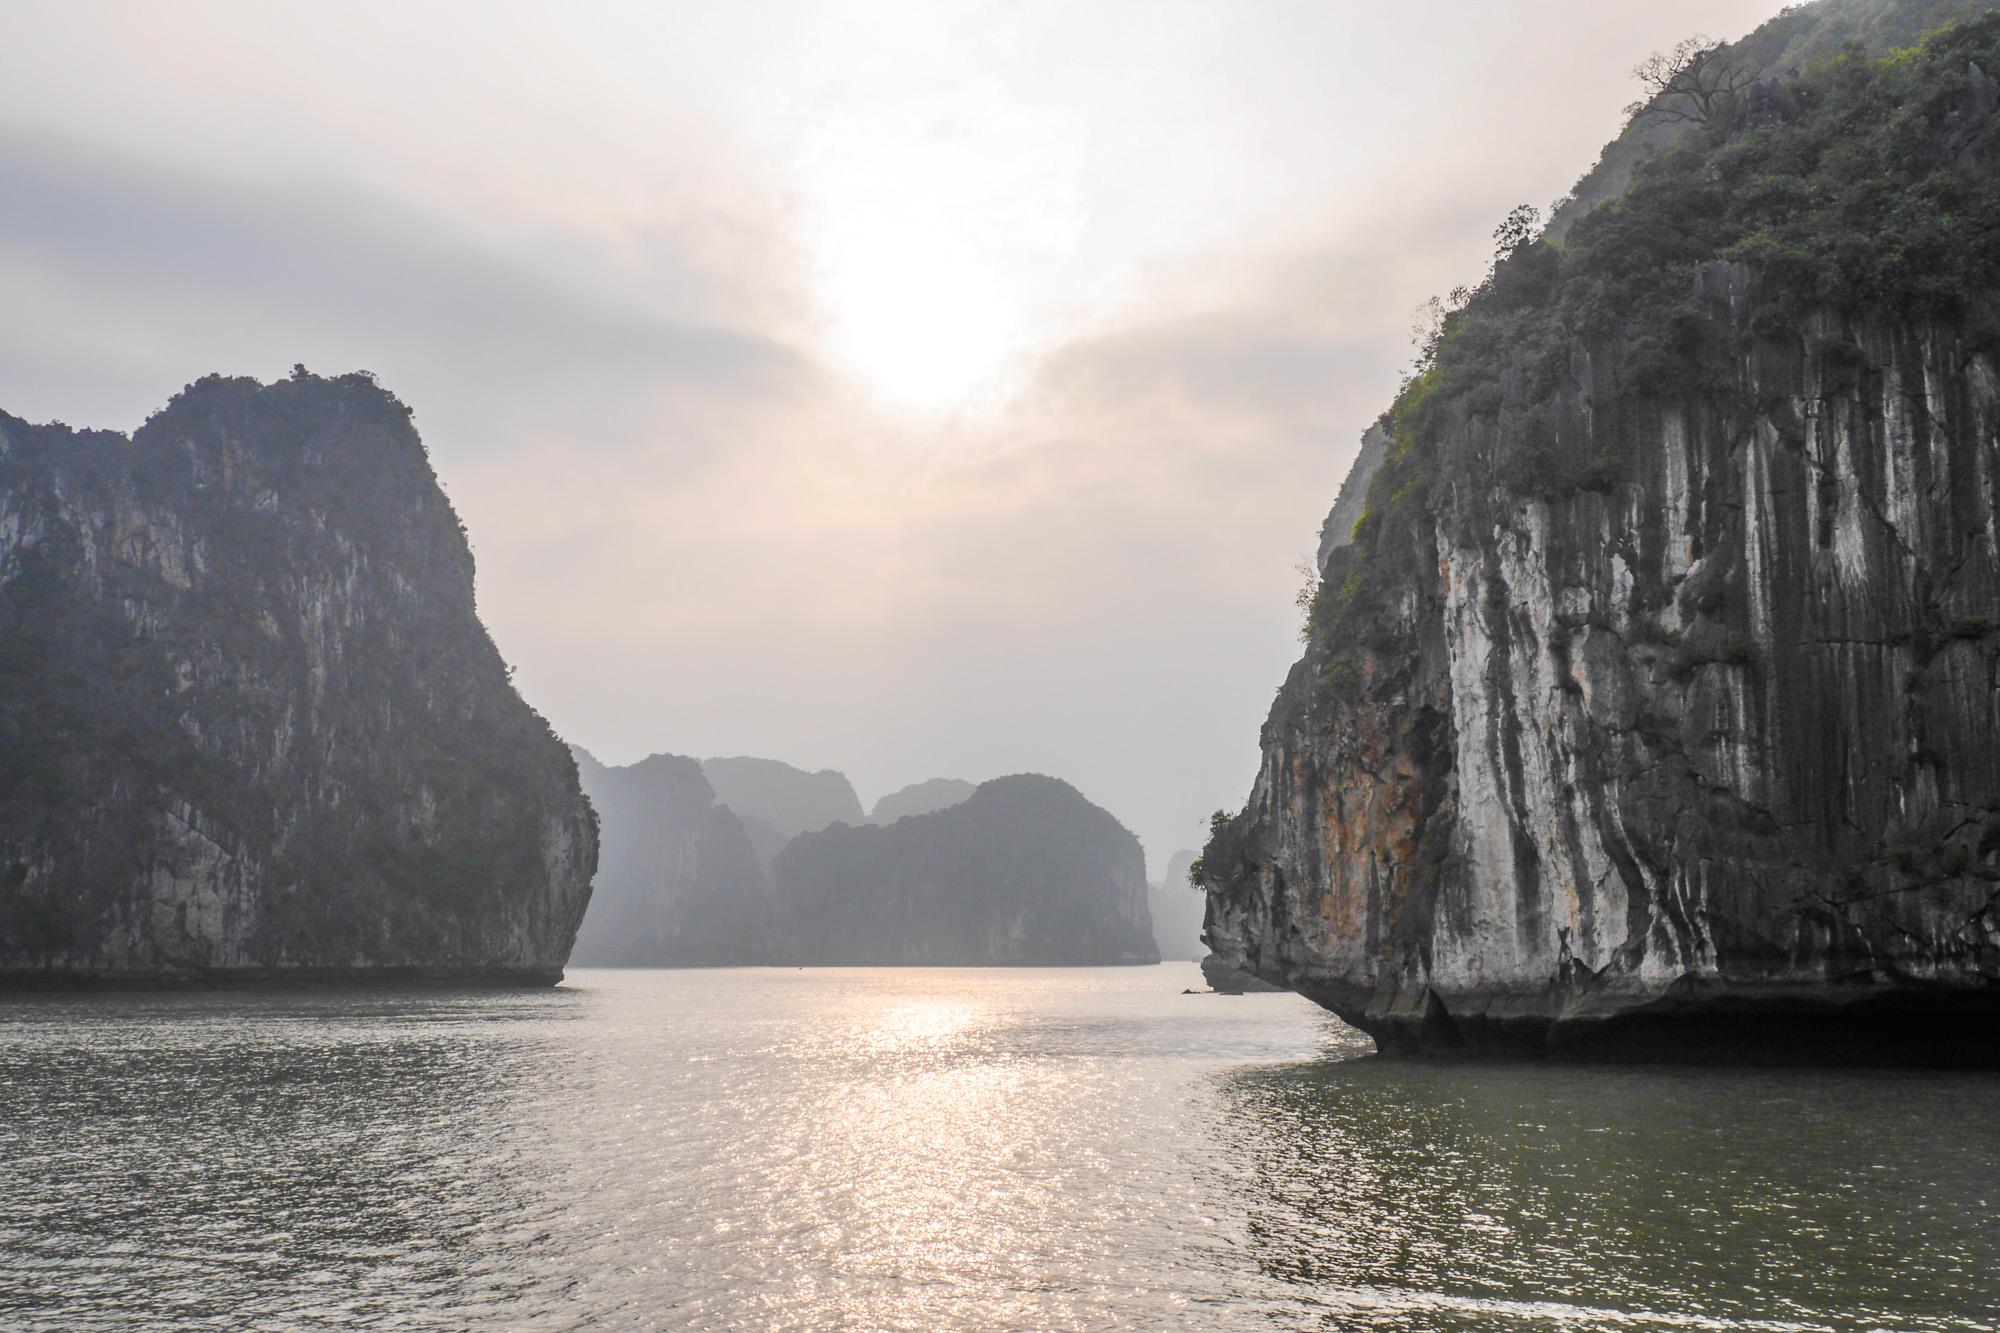 Stock: Ha Long Bay- Nick Stuckey-Beeri